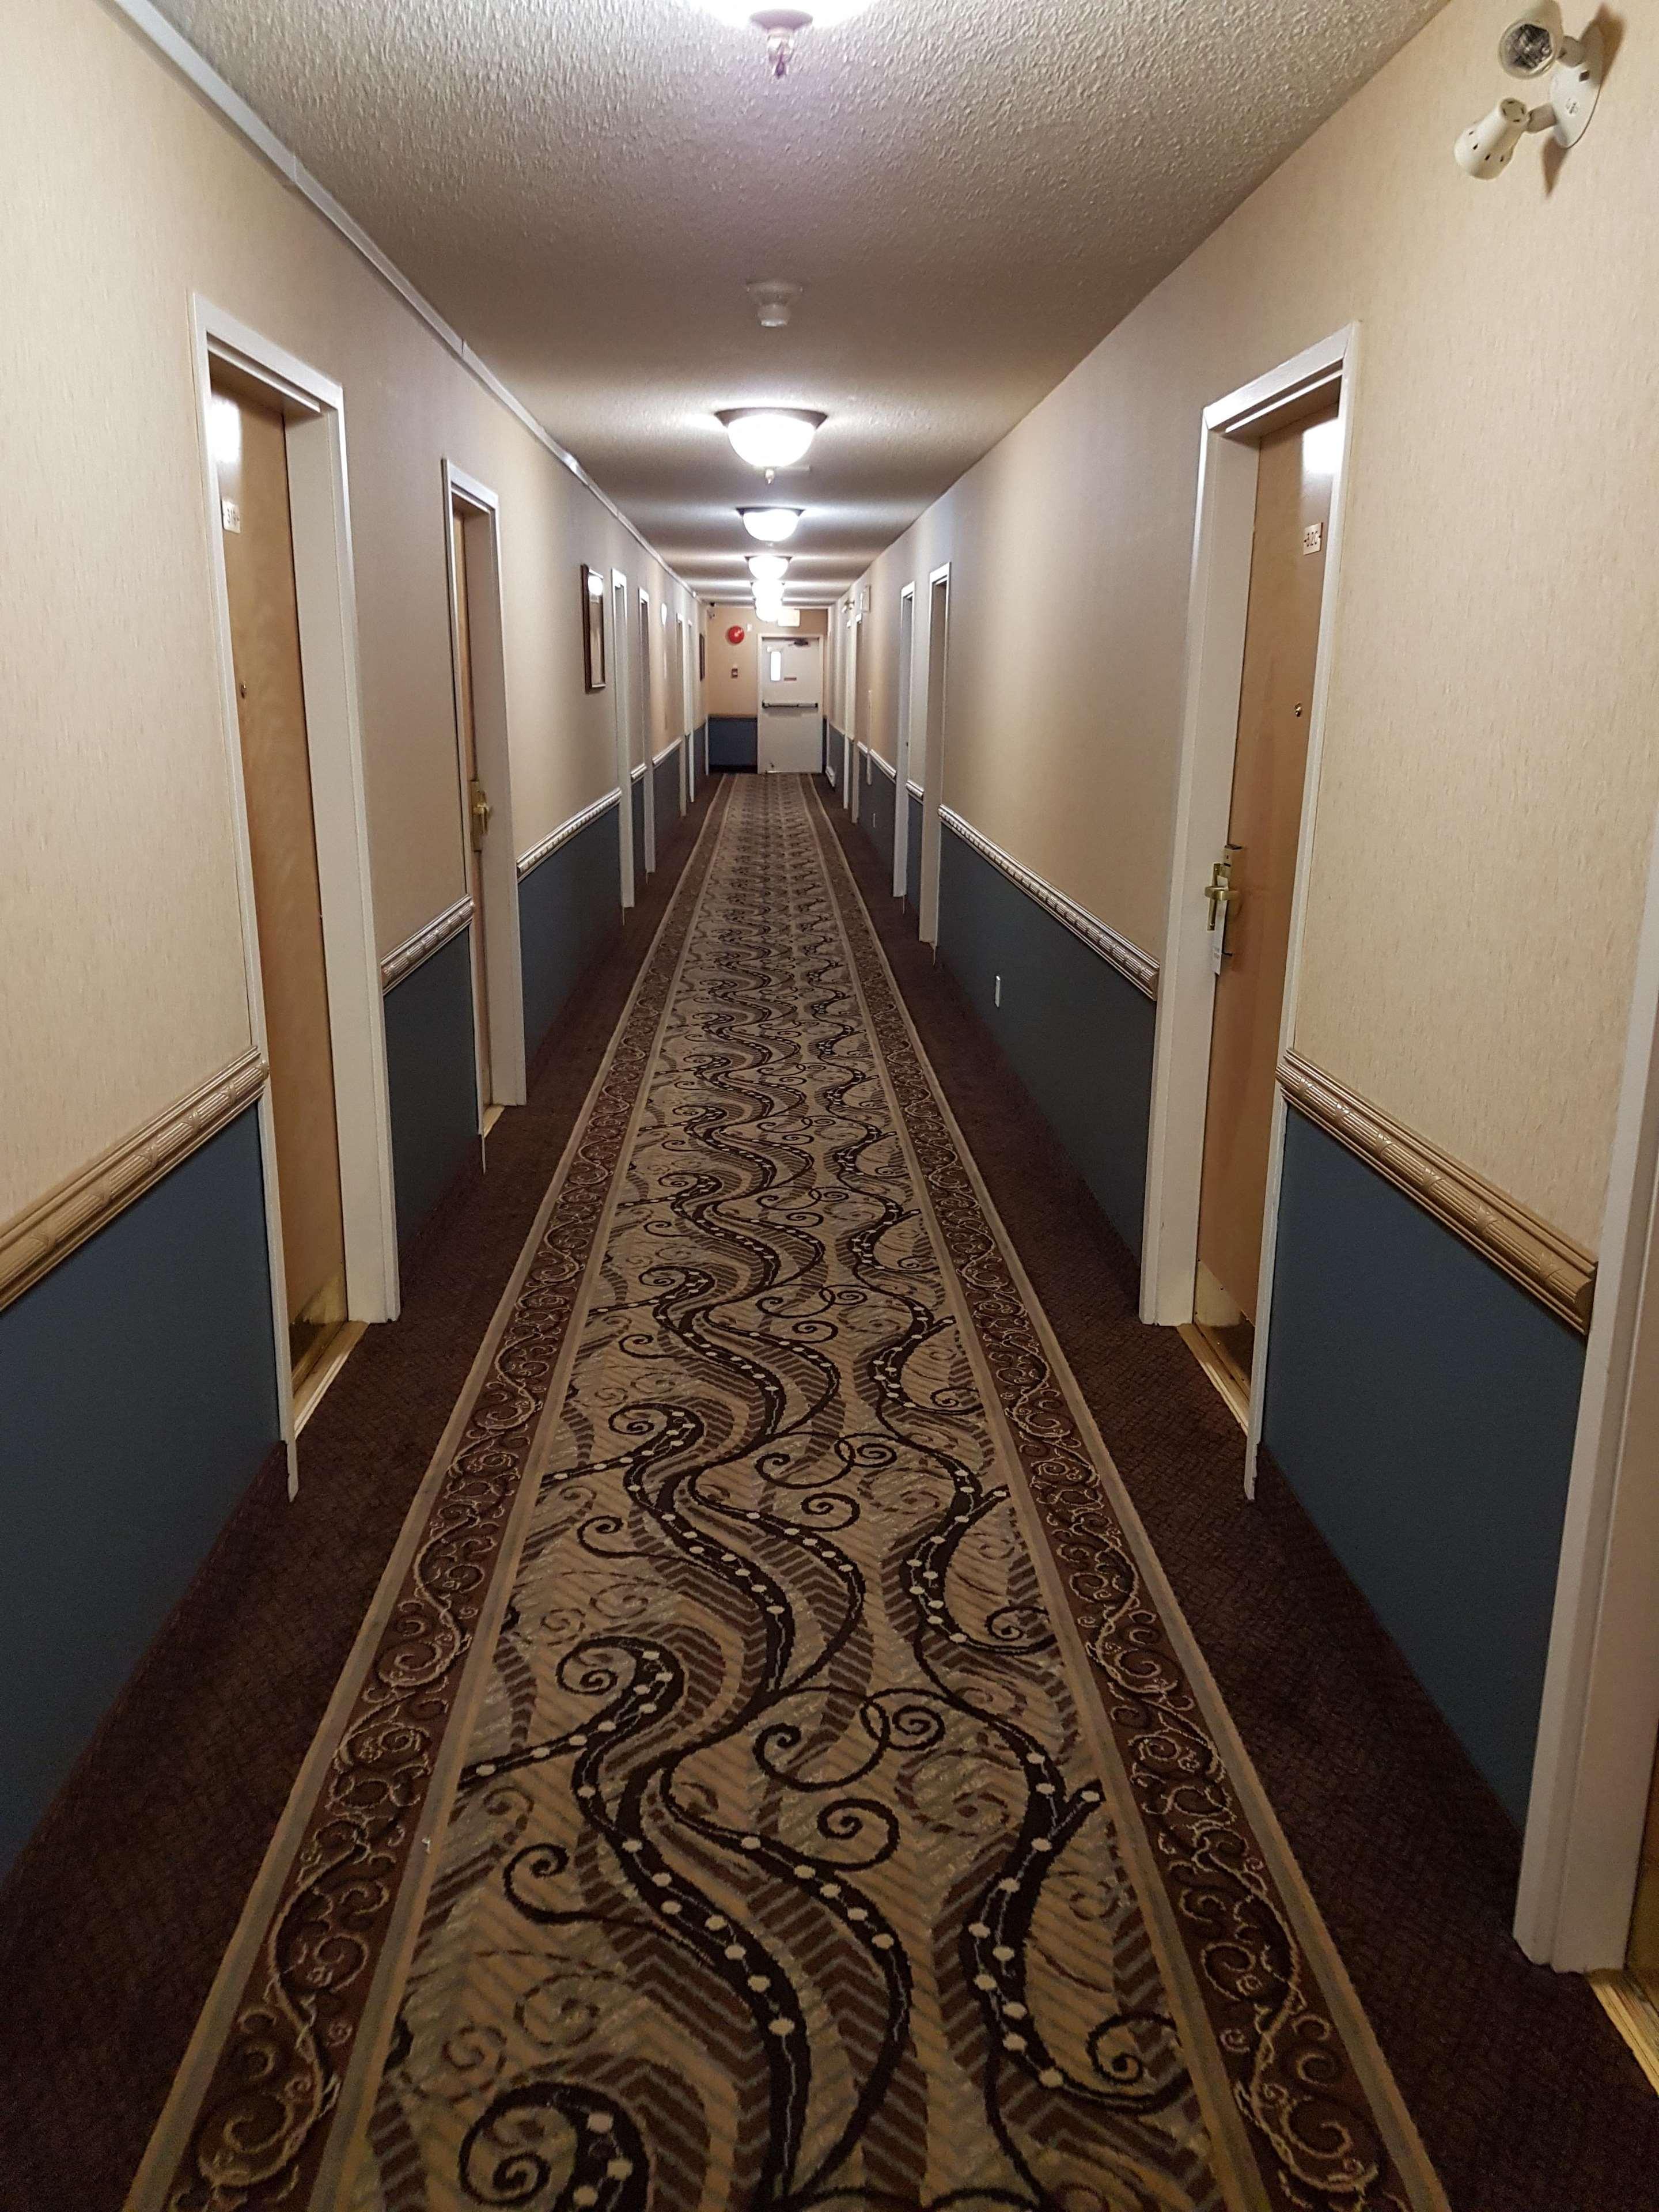 SureStay Plus Hotel by Best Western Coquitlam in Coquitlam: Interior Corridors